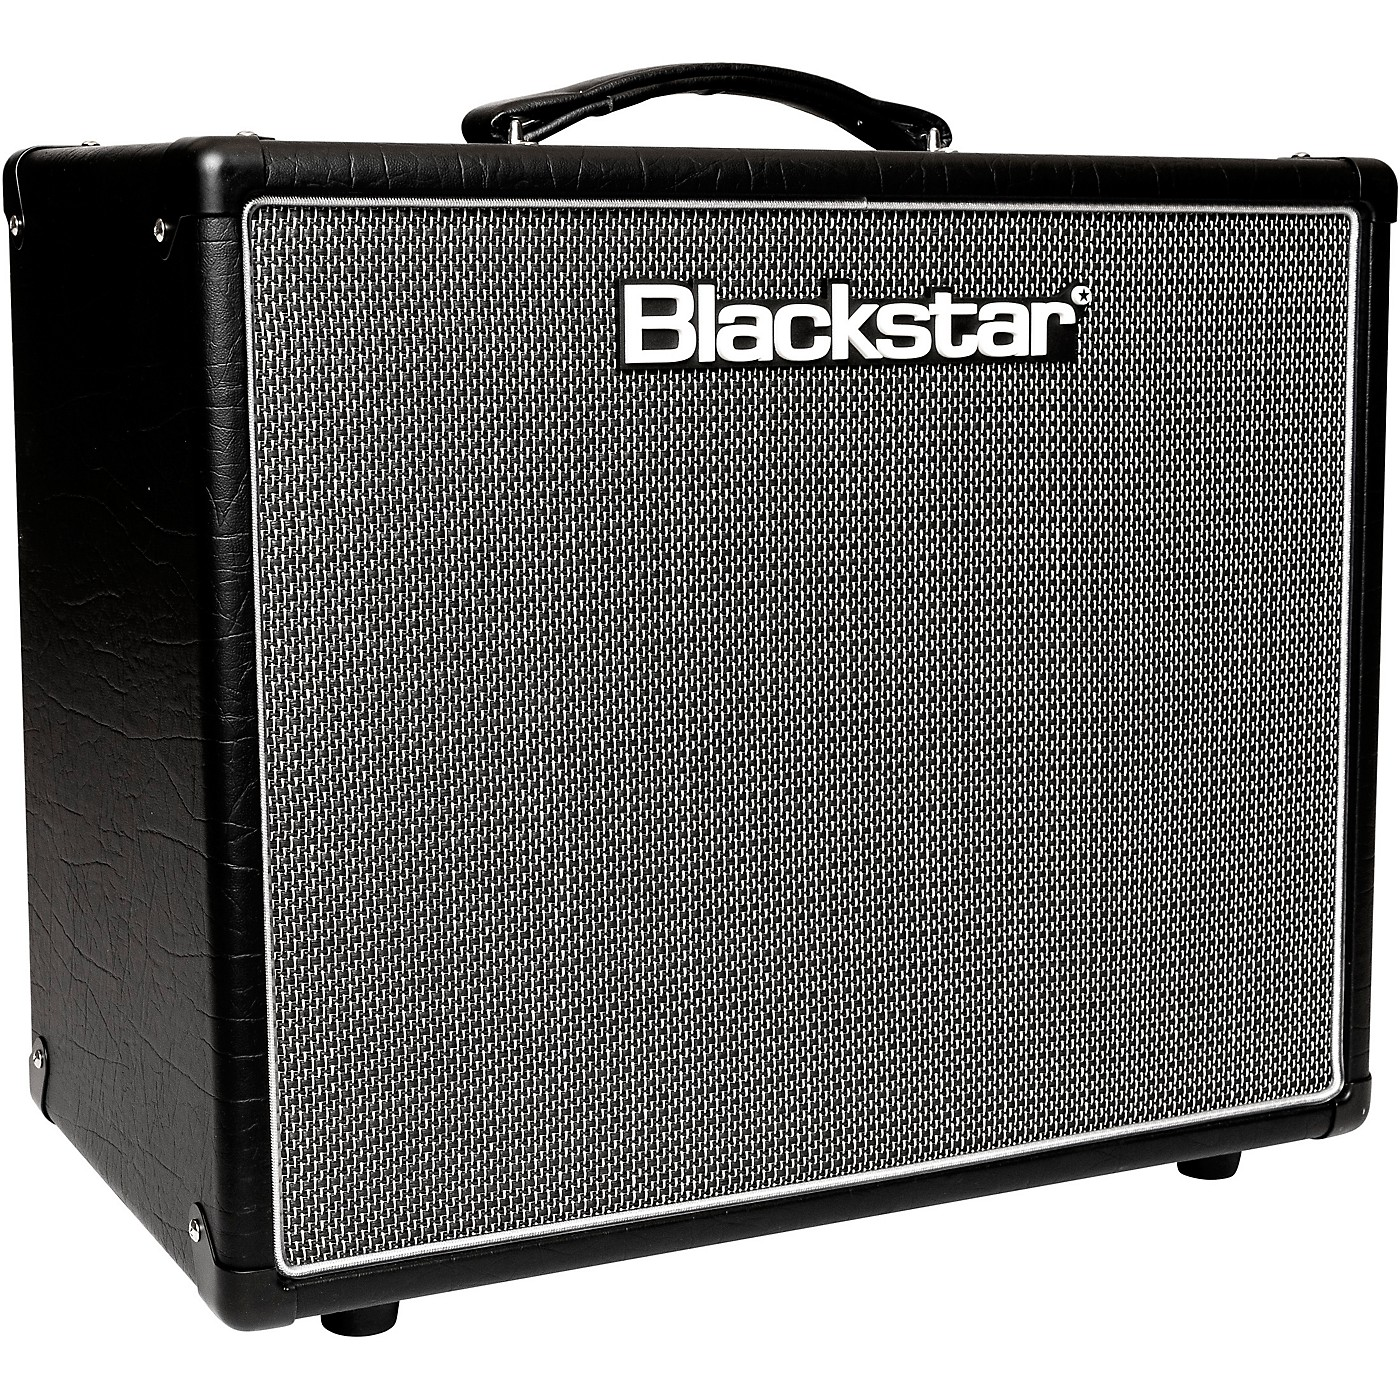 Blackstar HT-20R MkII 20W 1x12 Tube Combo Guitar Amp thumbnail